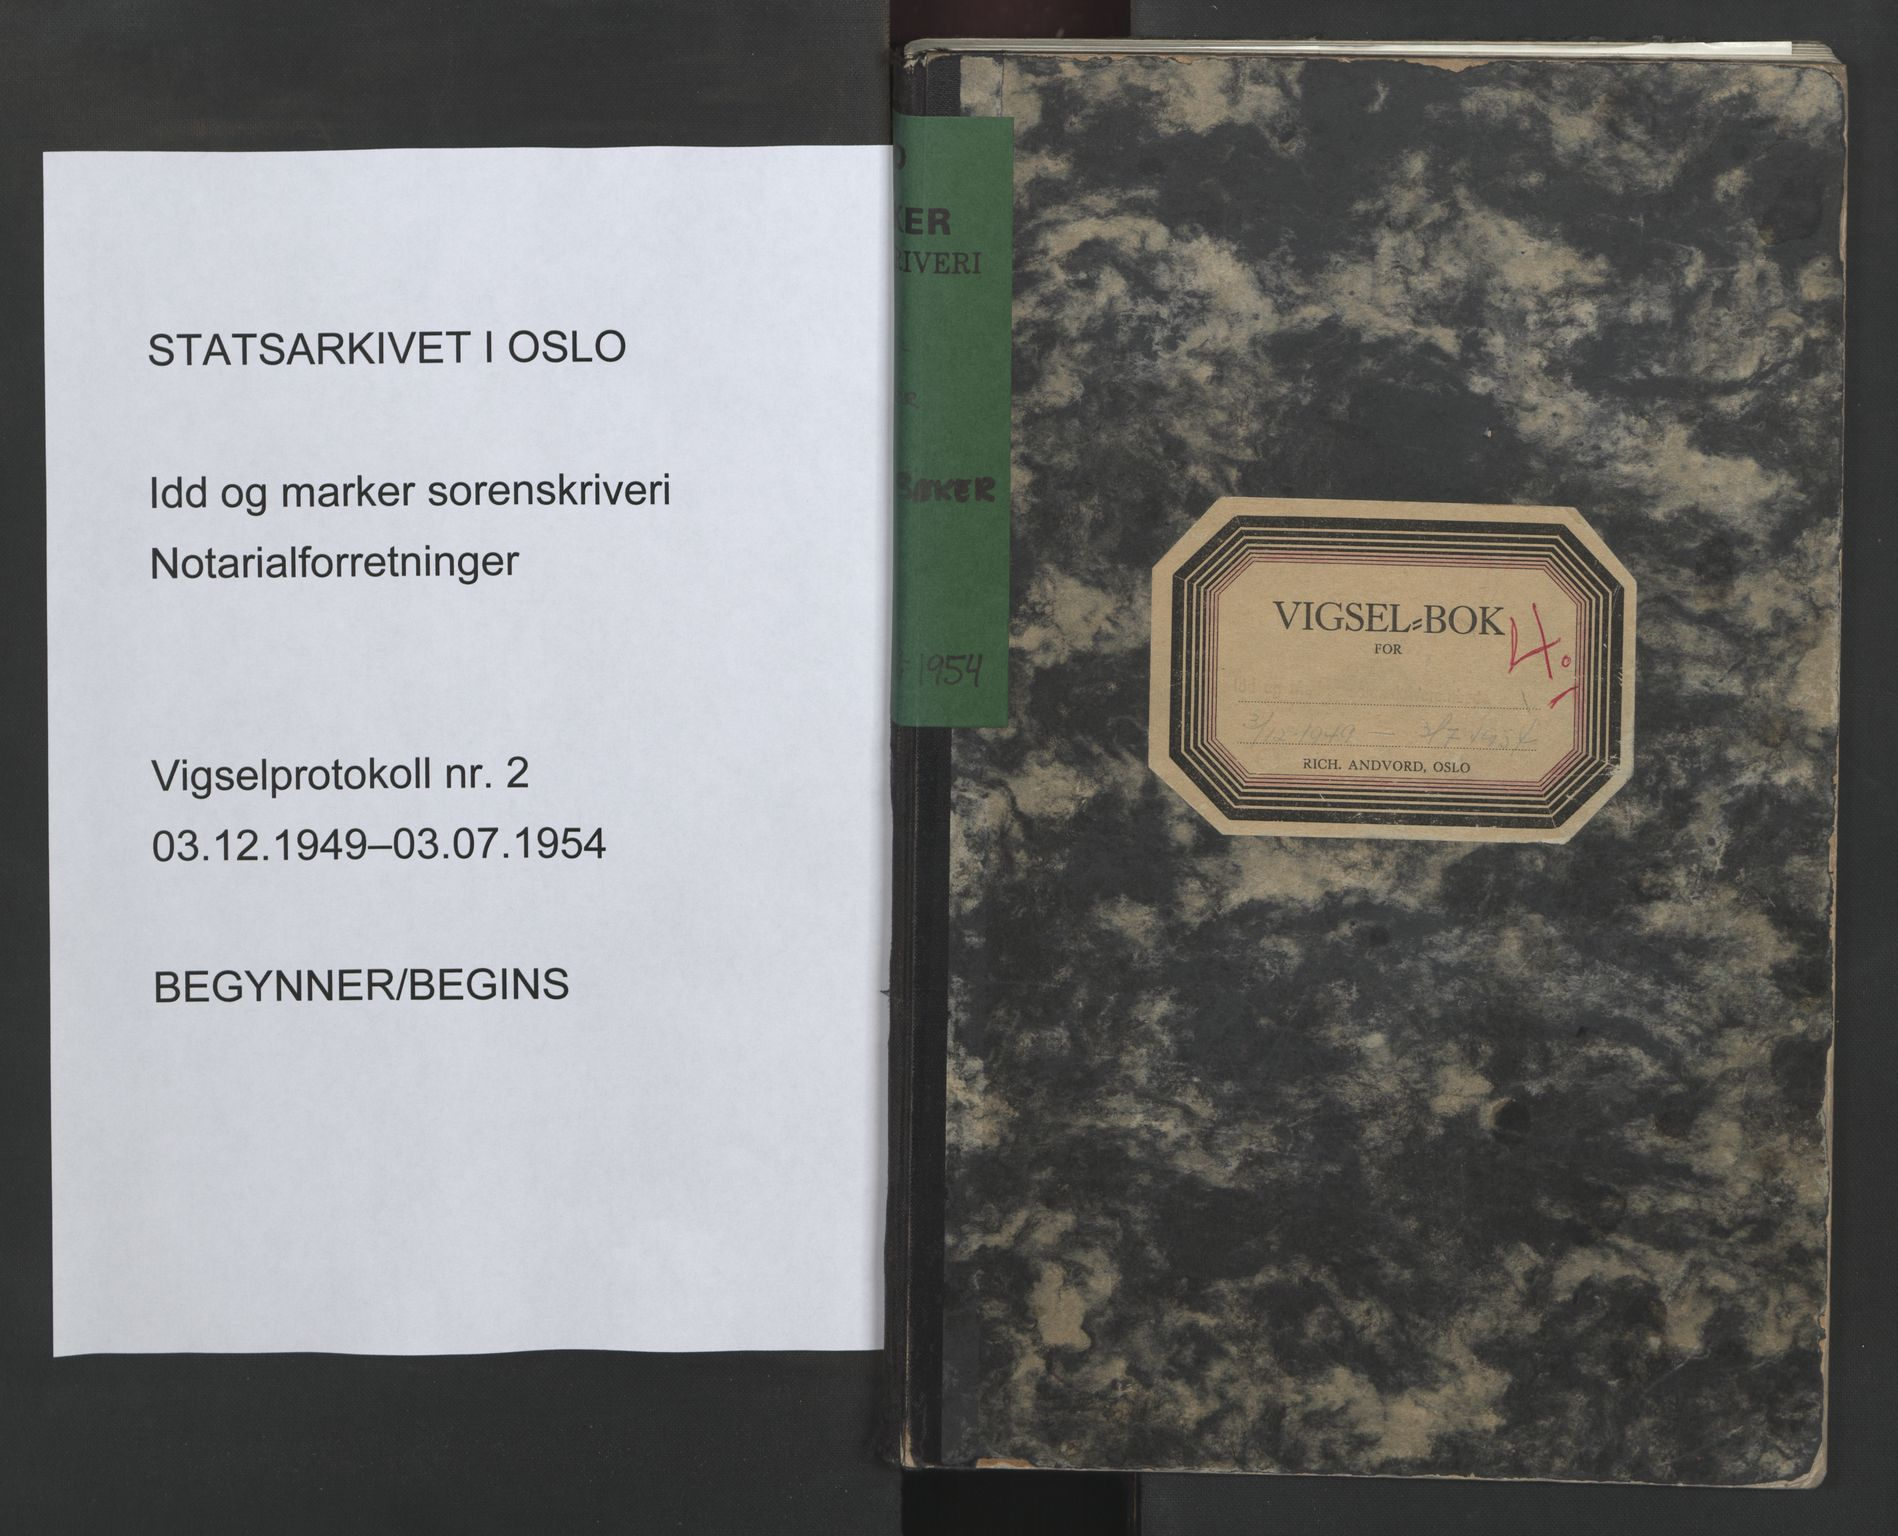 SAO, Idd og Marker sorenskriveri, L/Lc/L0002: Vigselsbok, 1949-1954, s. upaginert